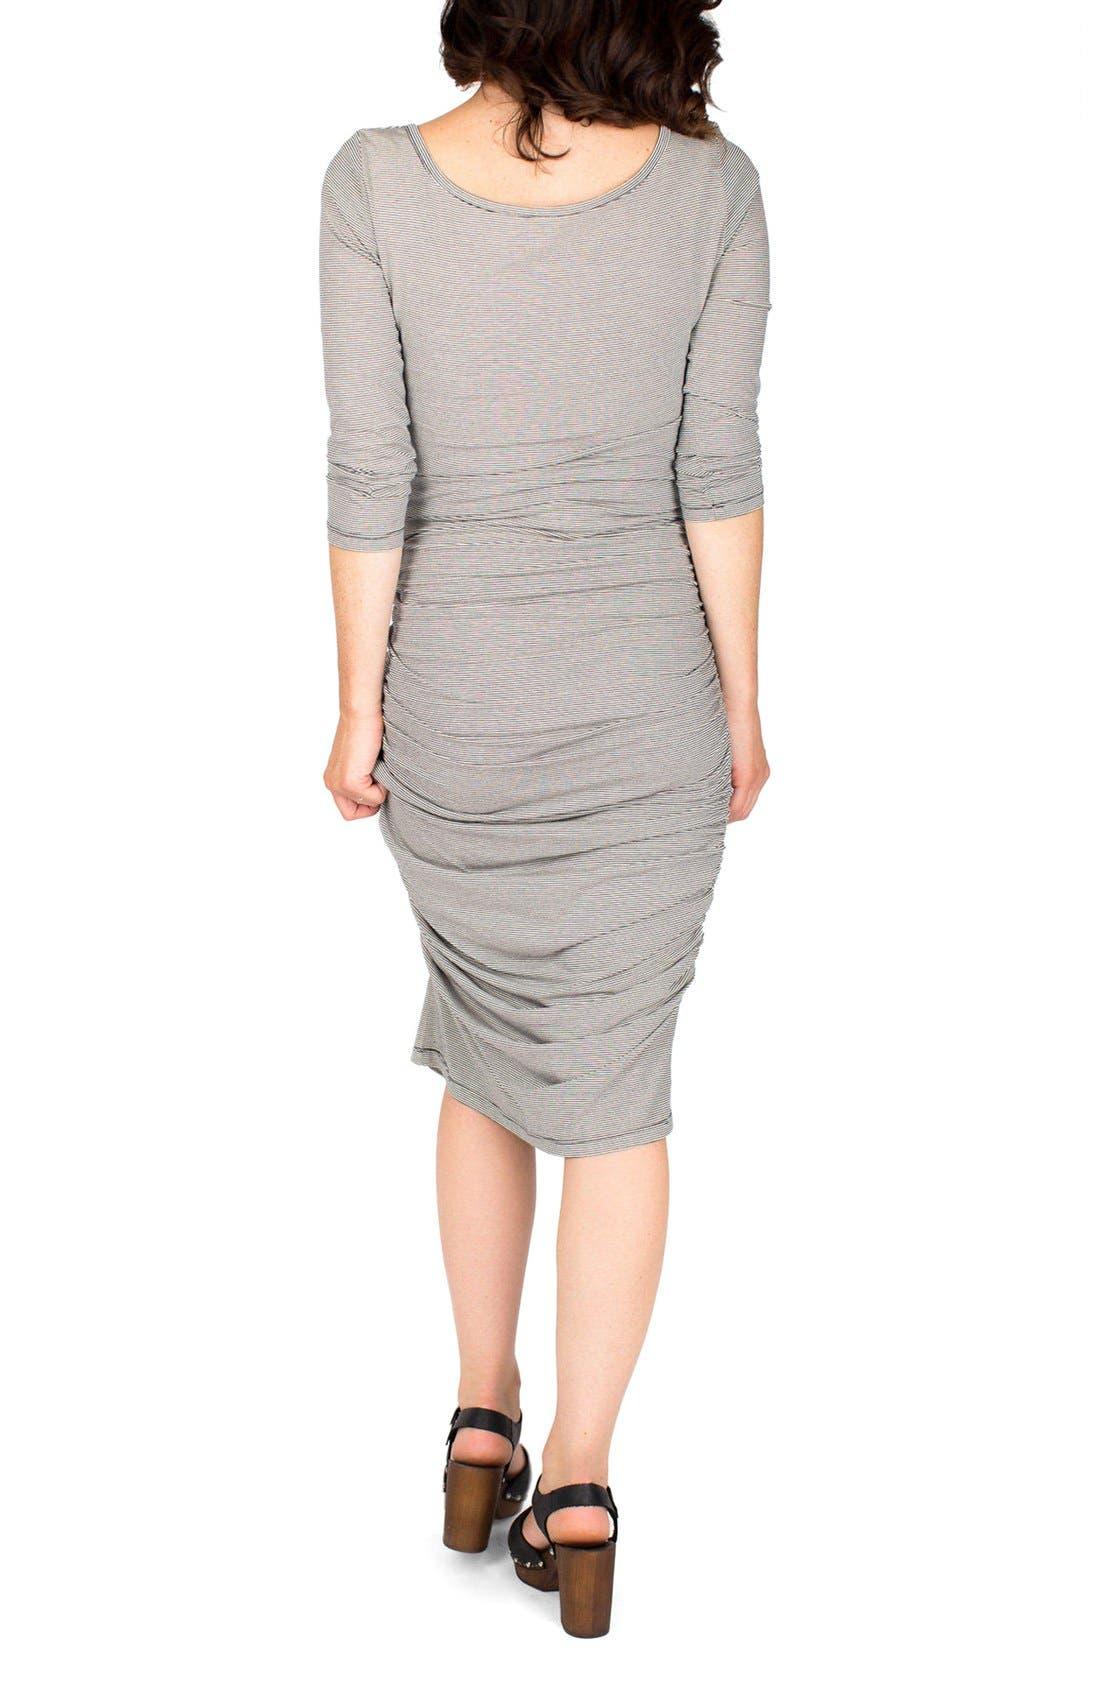 Nom Henley Maternity Dress,                             Alternate thumbnail 2, color,                             CHARCOAL MICROSTRIPE